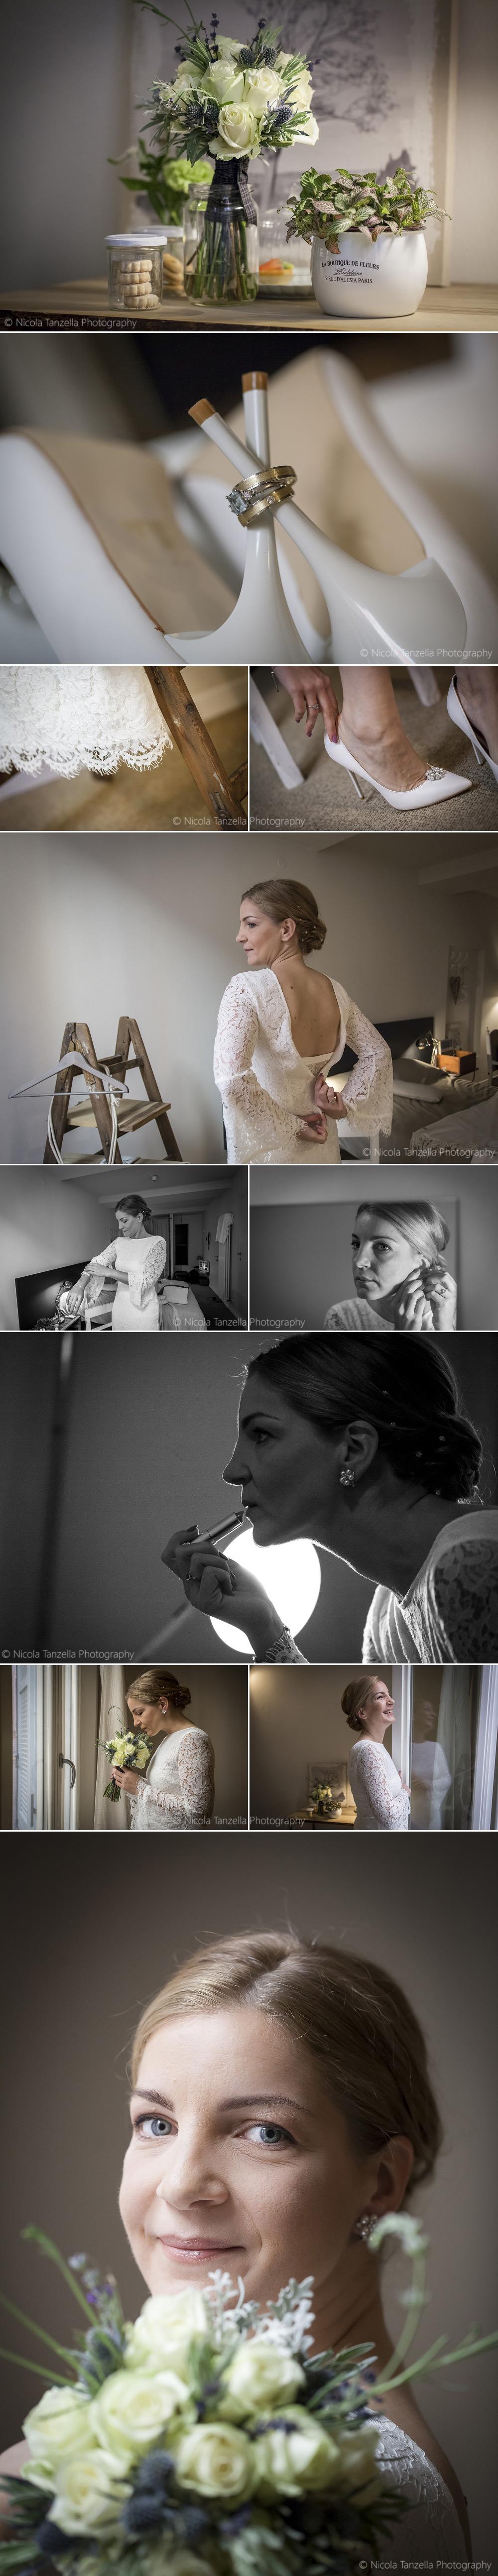 fotografo matrimonio modena-2